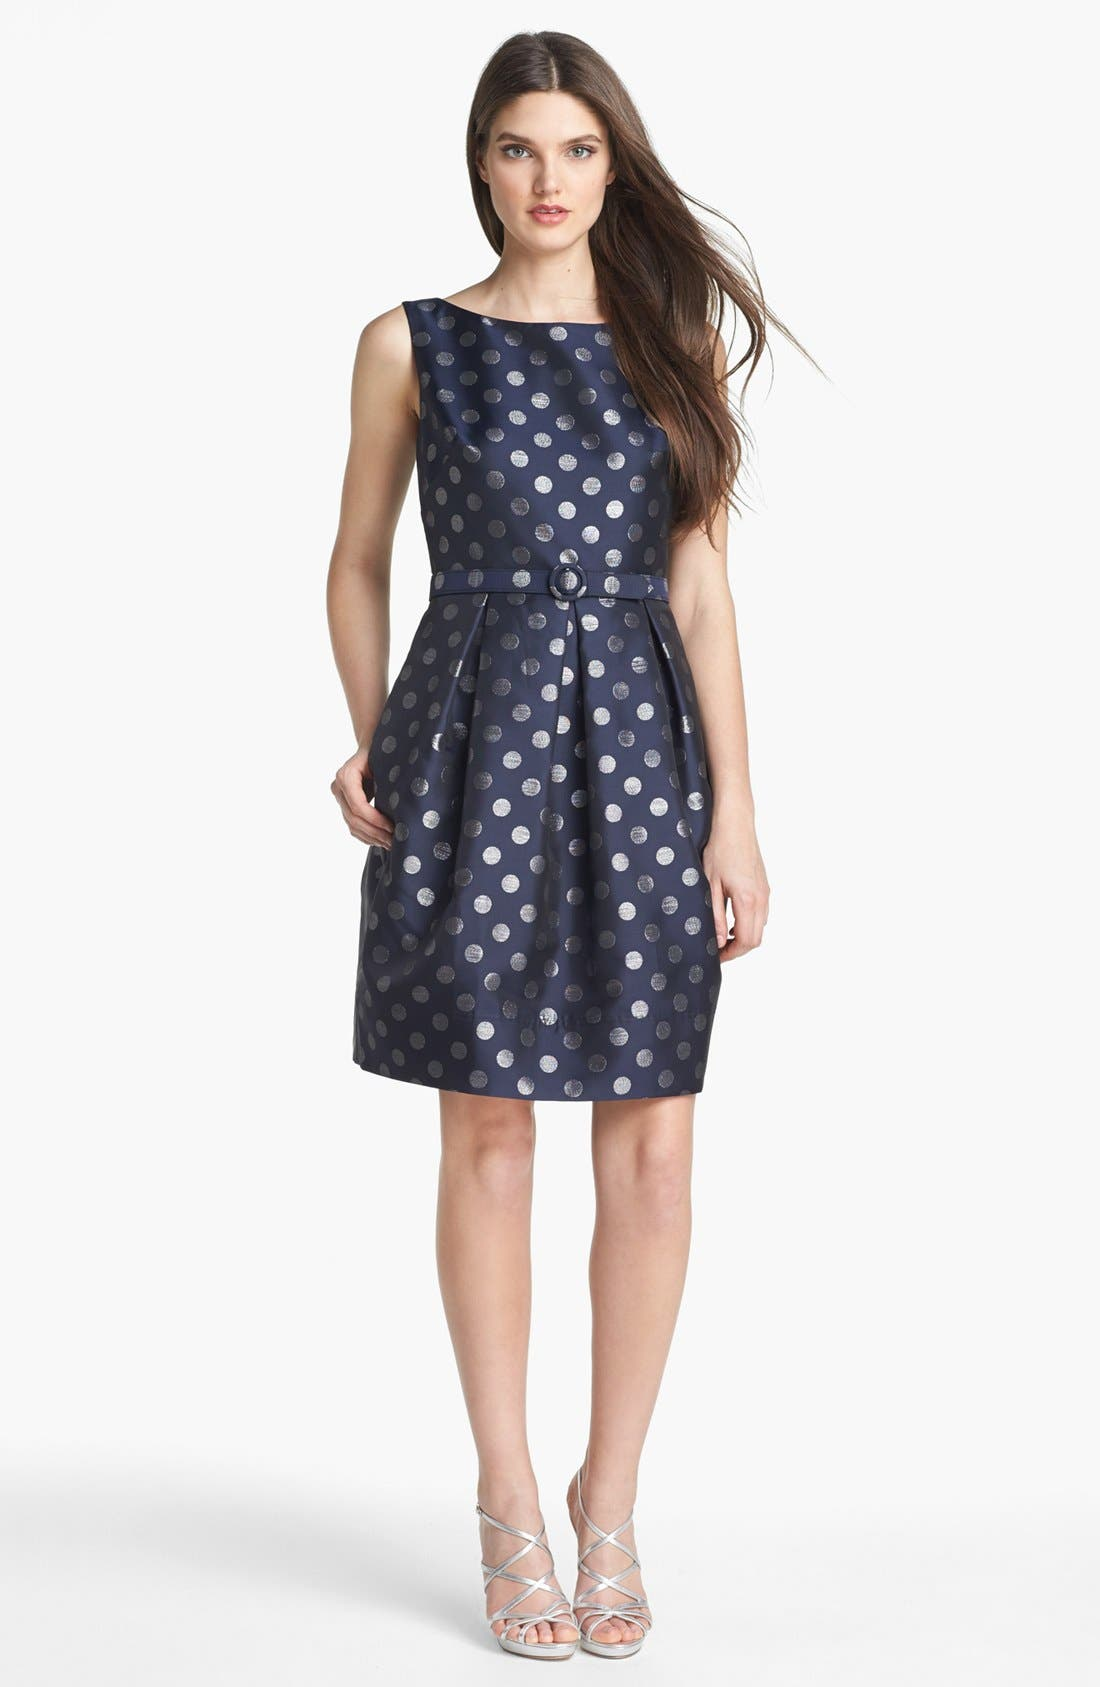 Alternate Image 1 Selected - Eliza J Metallic Polka Dot Fit & Flare Dress